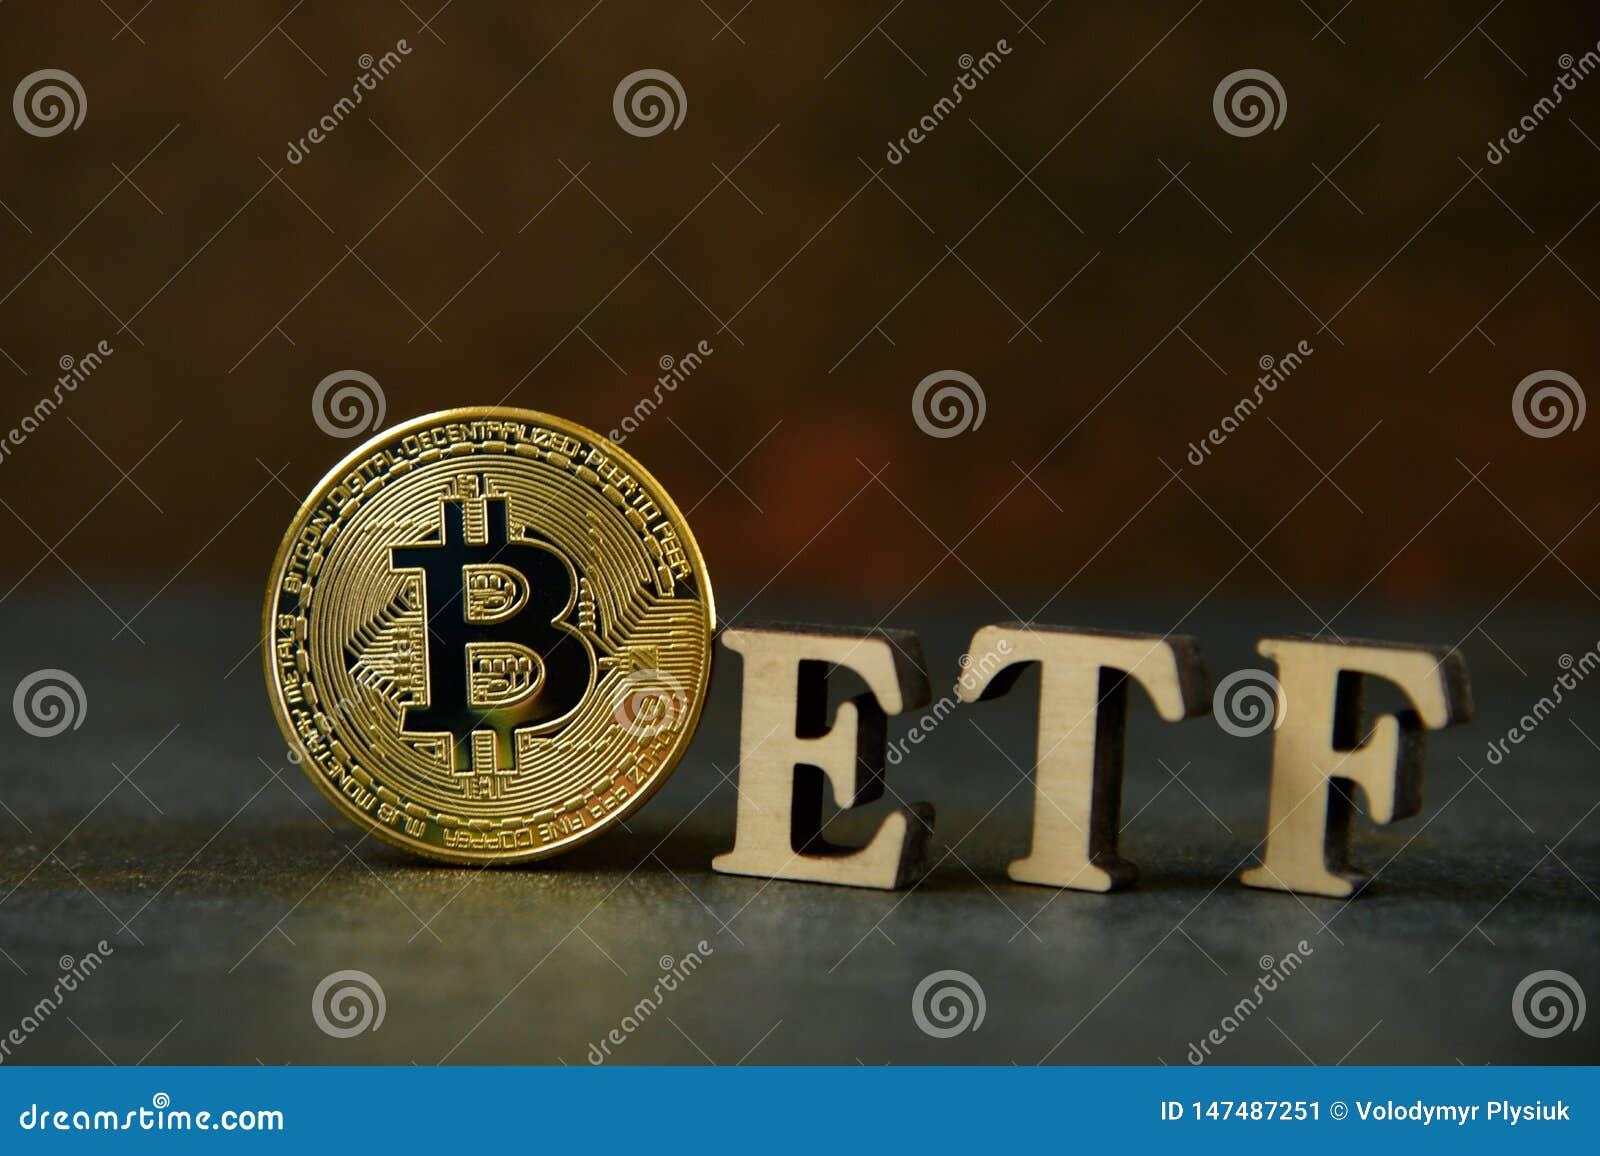 bitcoin mining etf